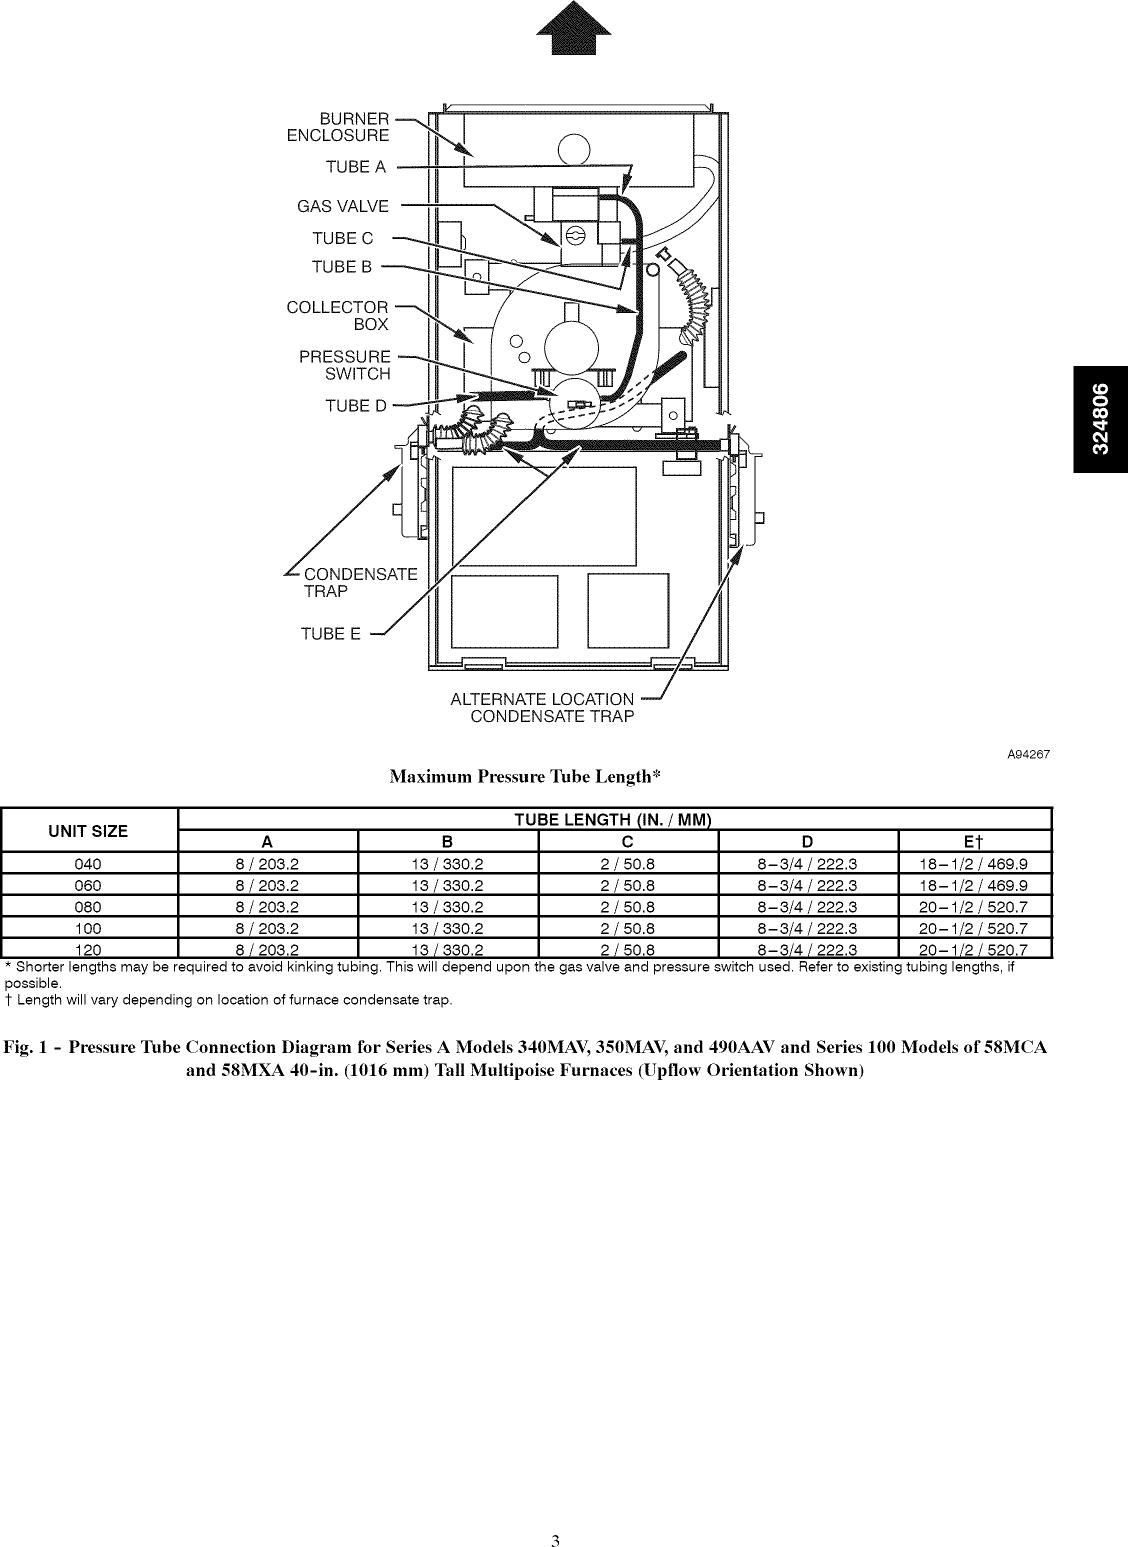 Schematic Of Bryant Ga Furnace Wiring Diagram